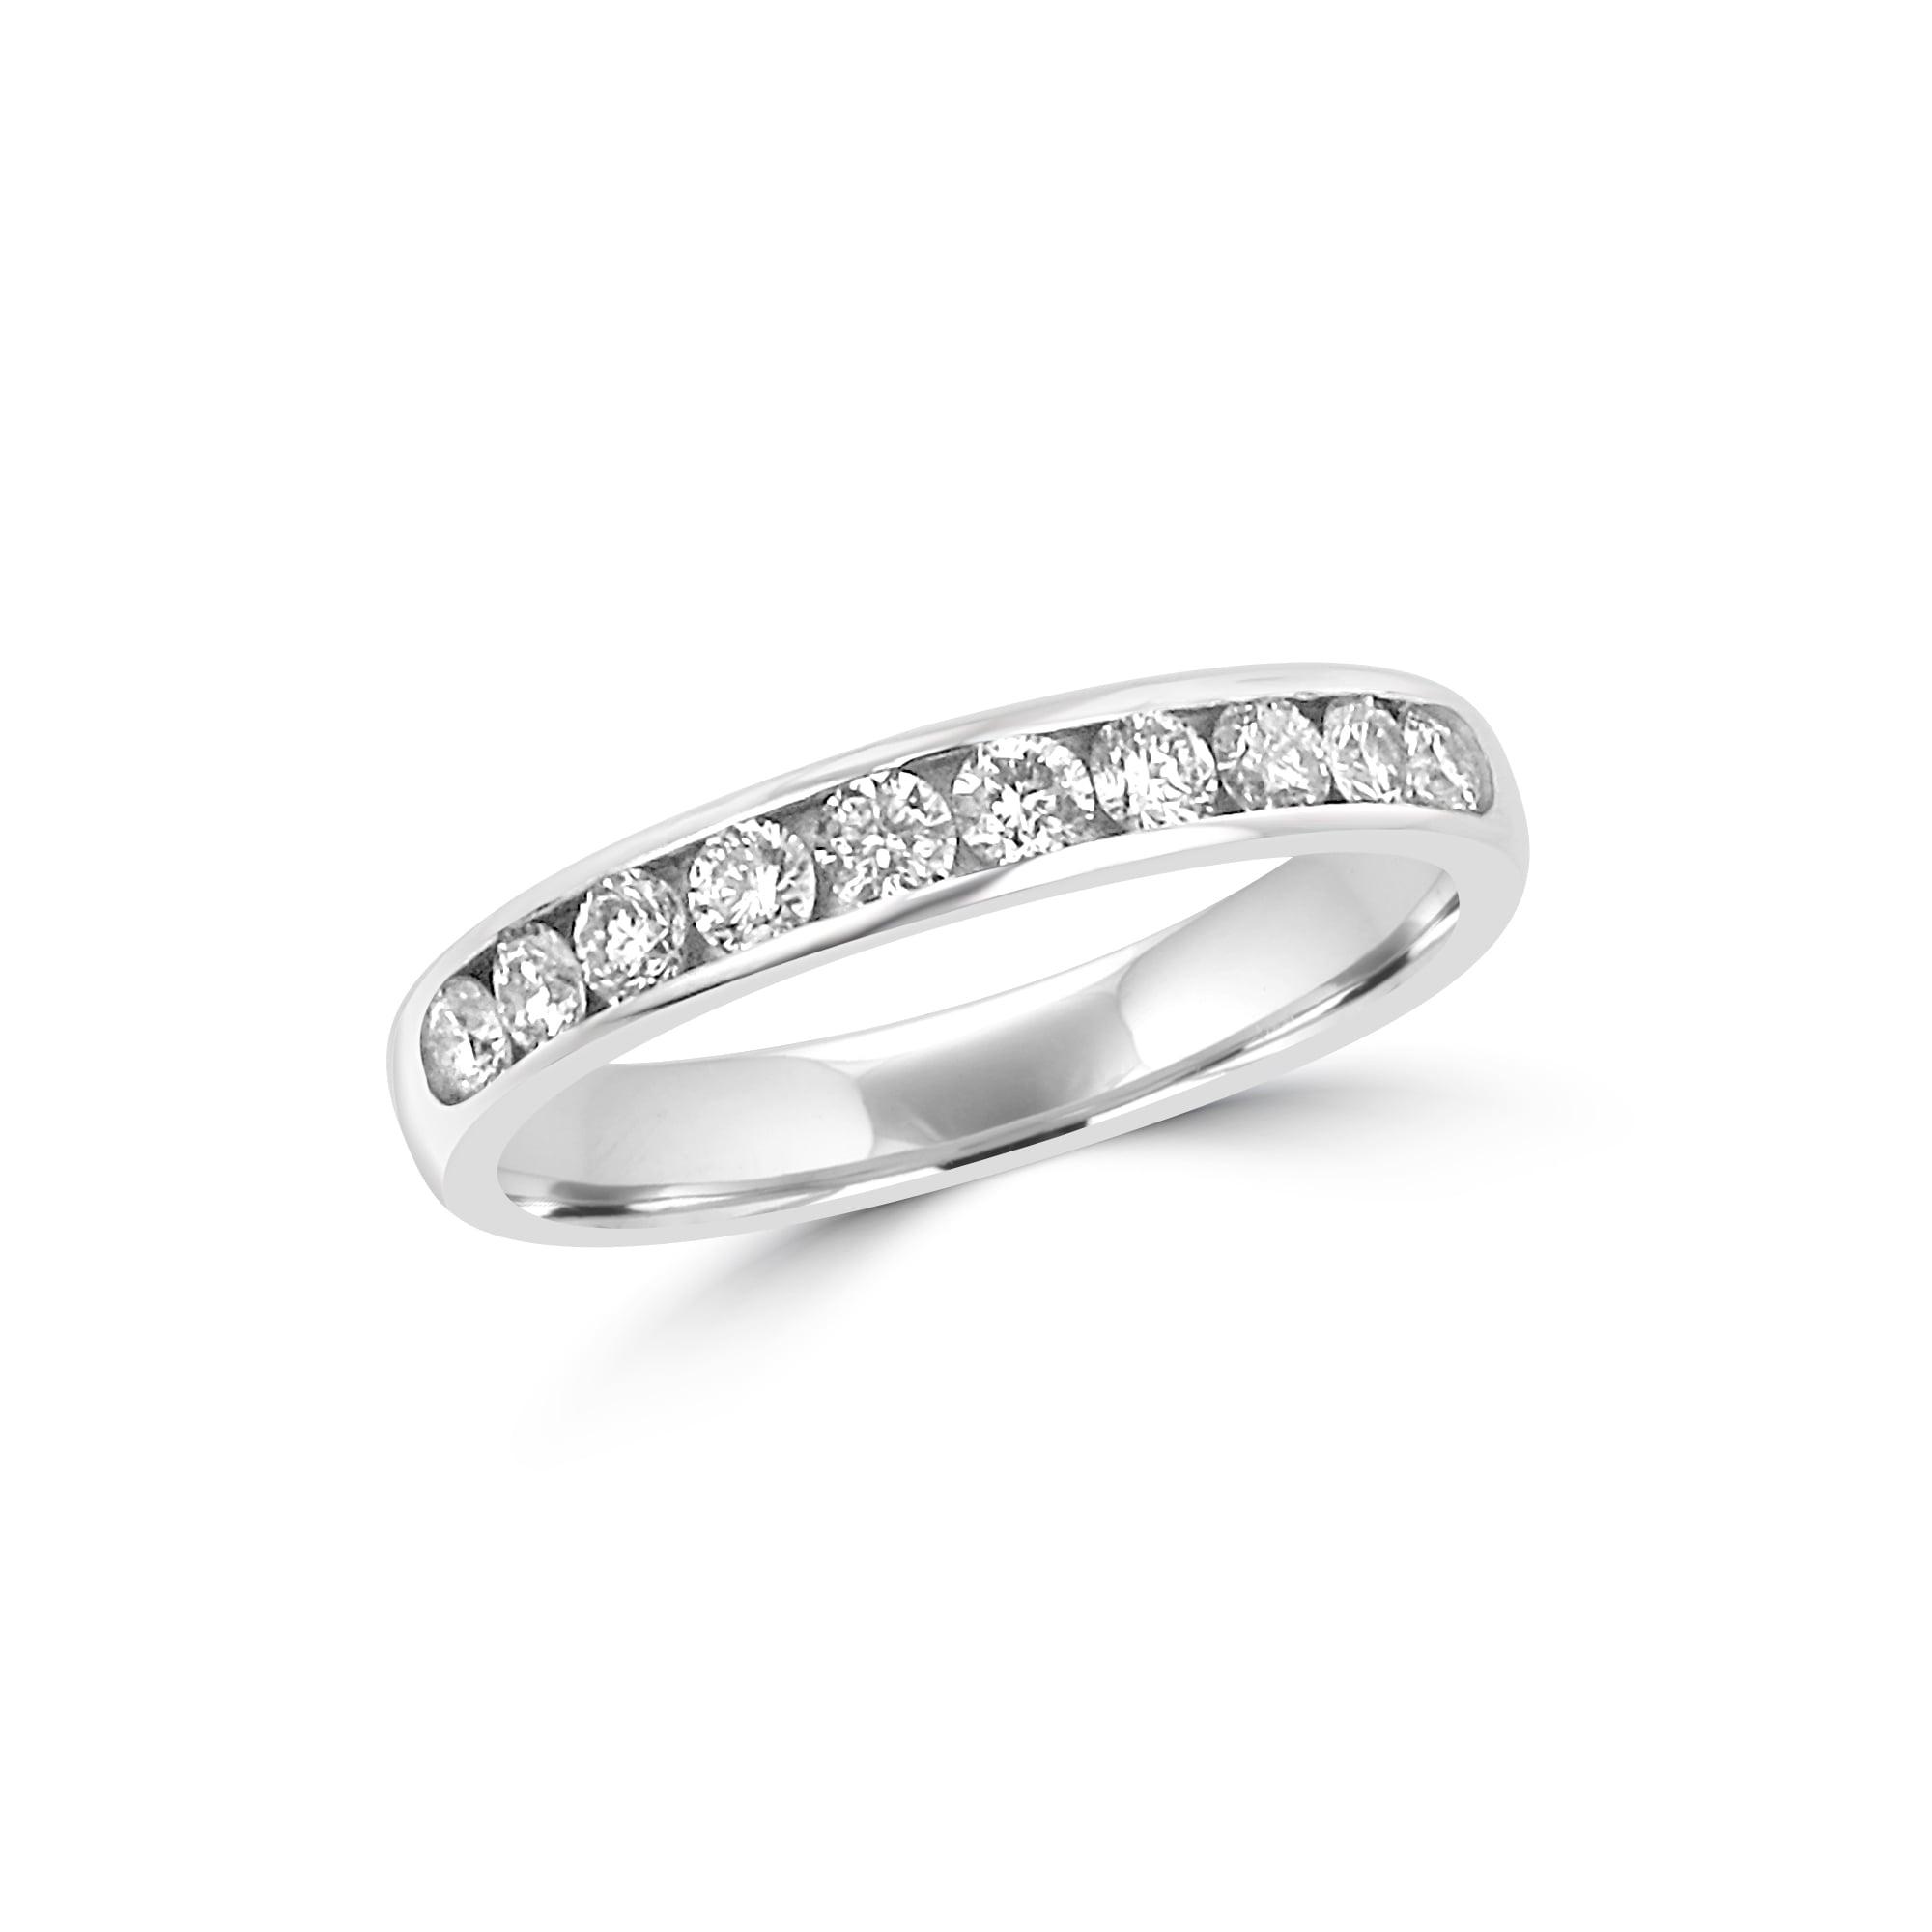 3 5mm Court Round Diamond Platinum Wedding Ring Womens from